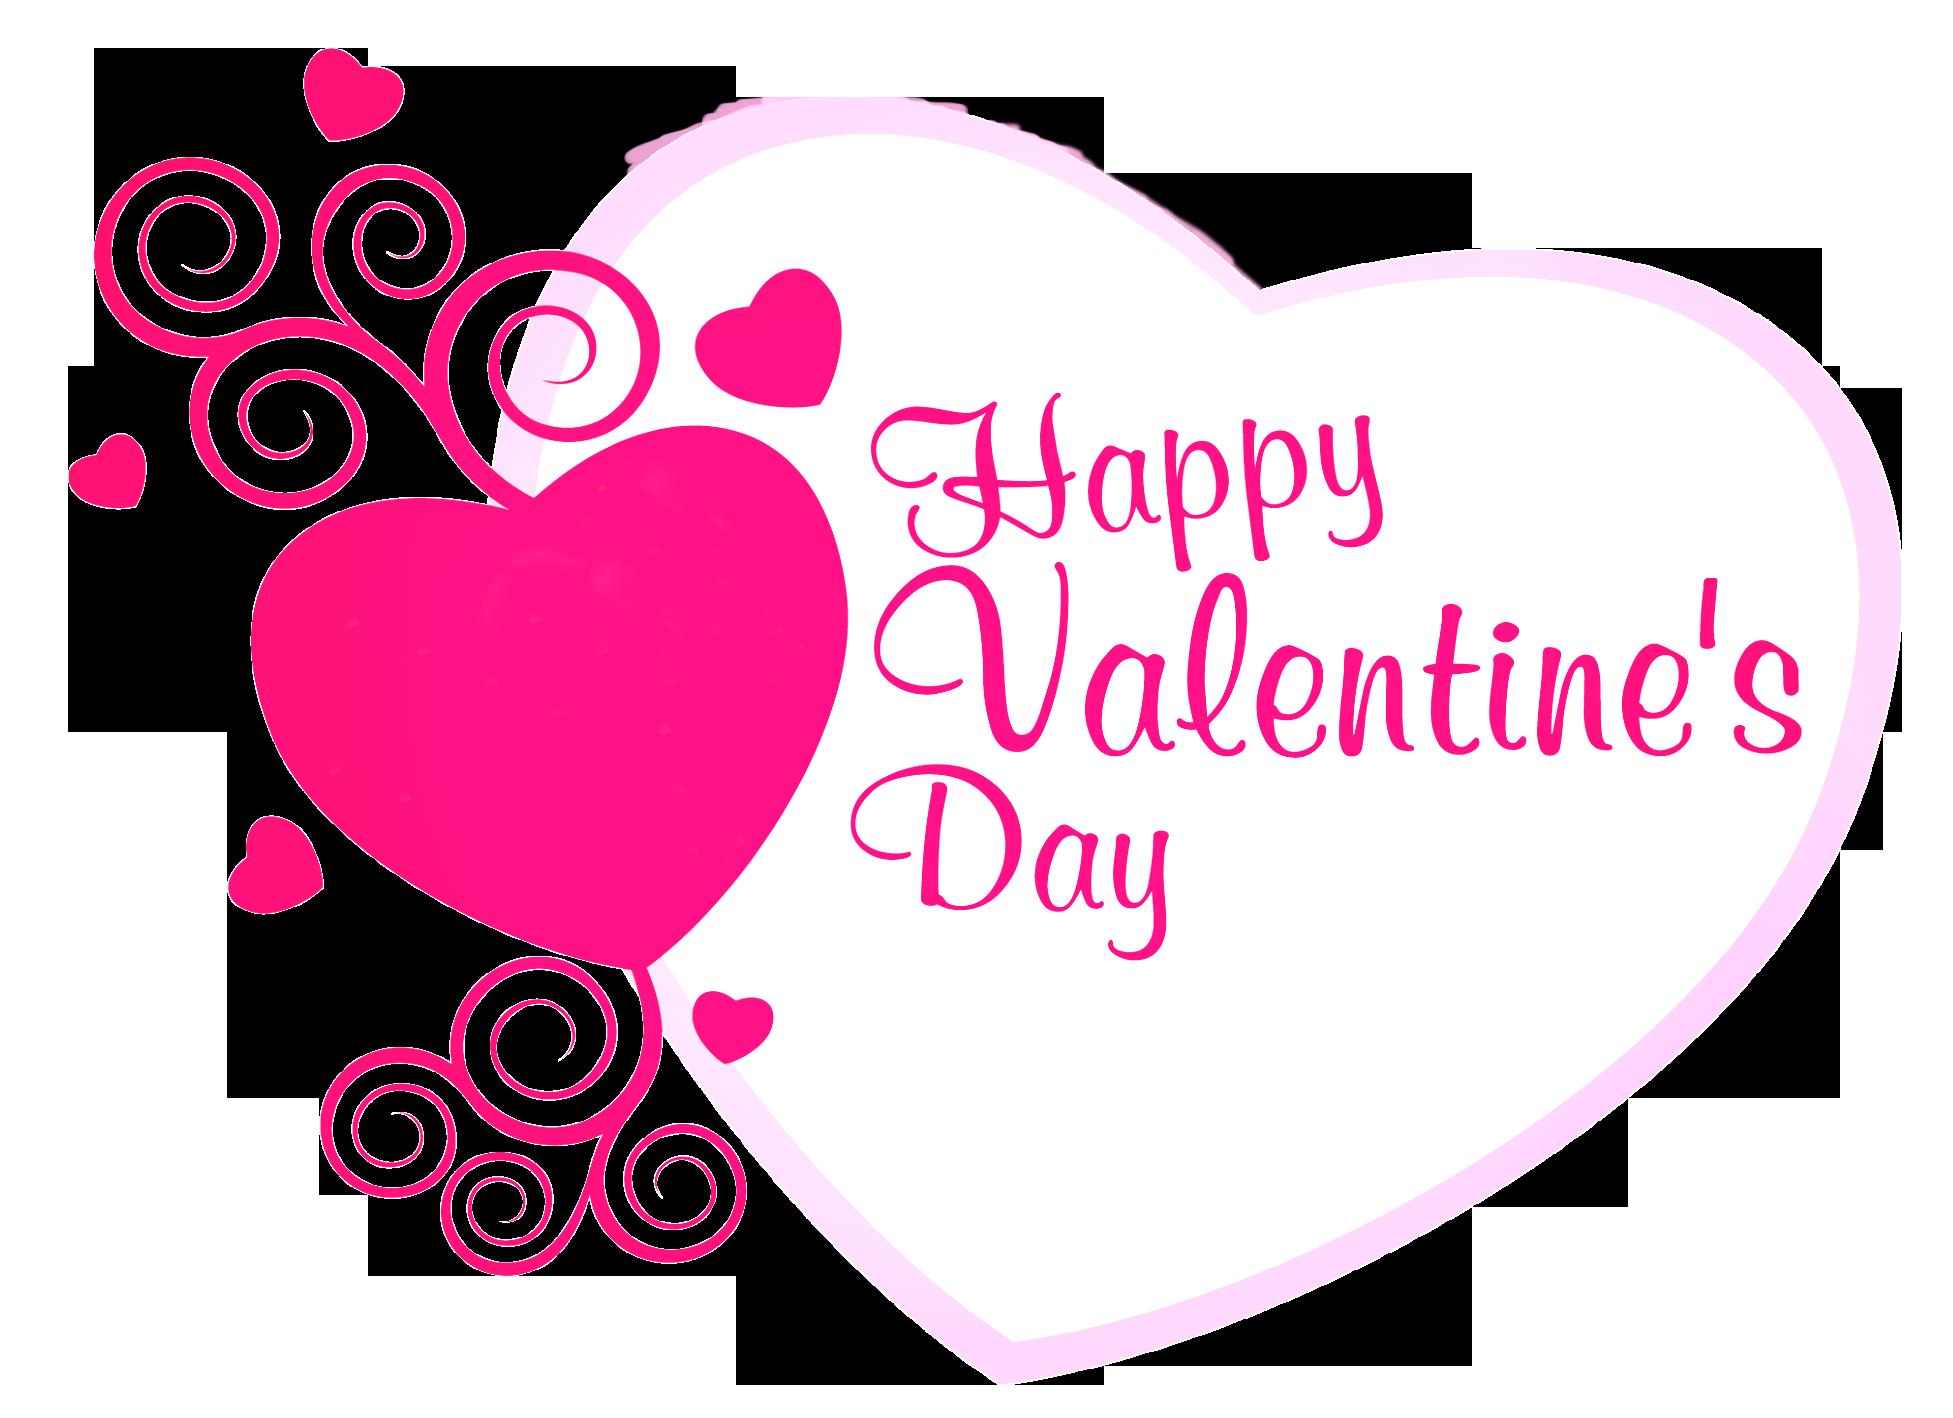 clip art black and white download Valentine vector wallpaper. Happy valentines pink heart